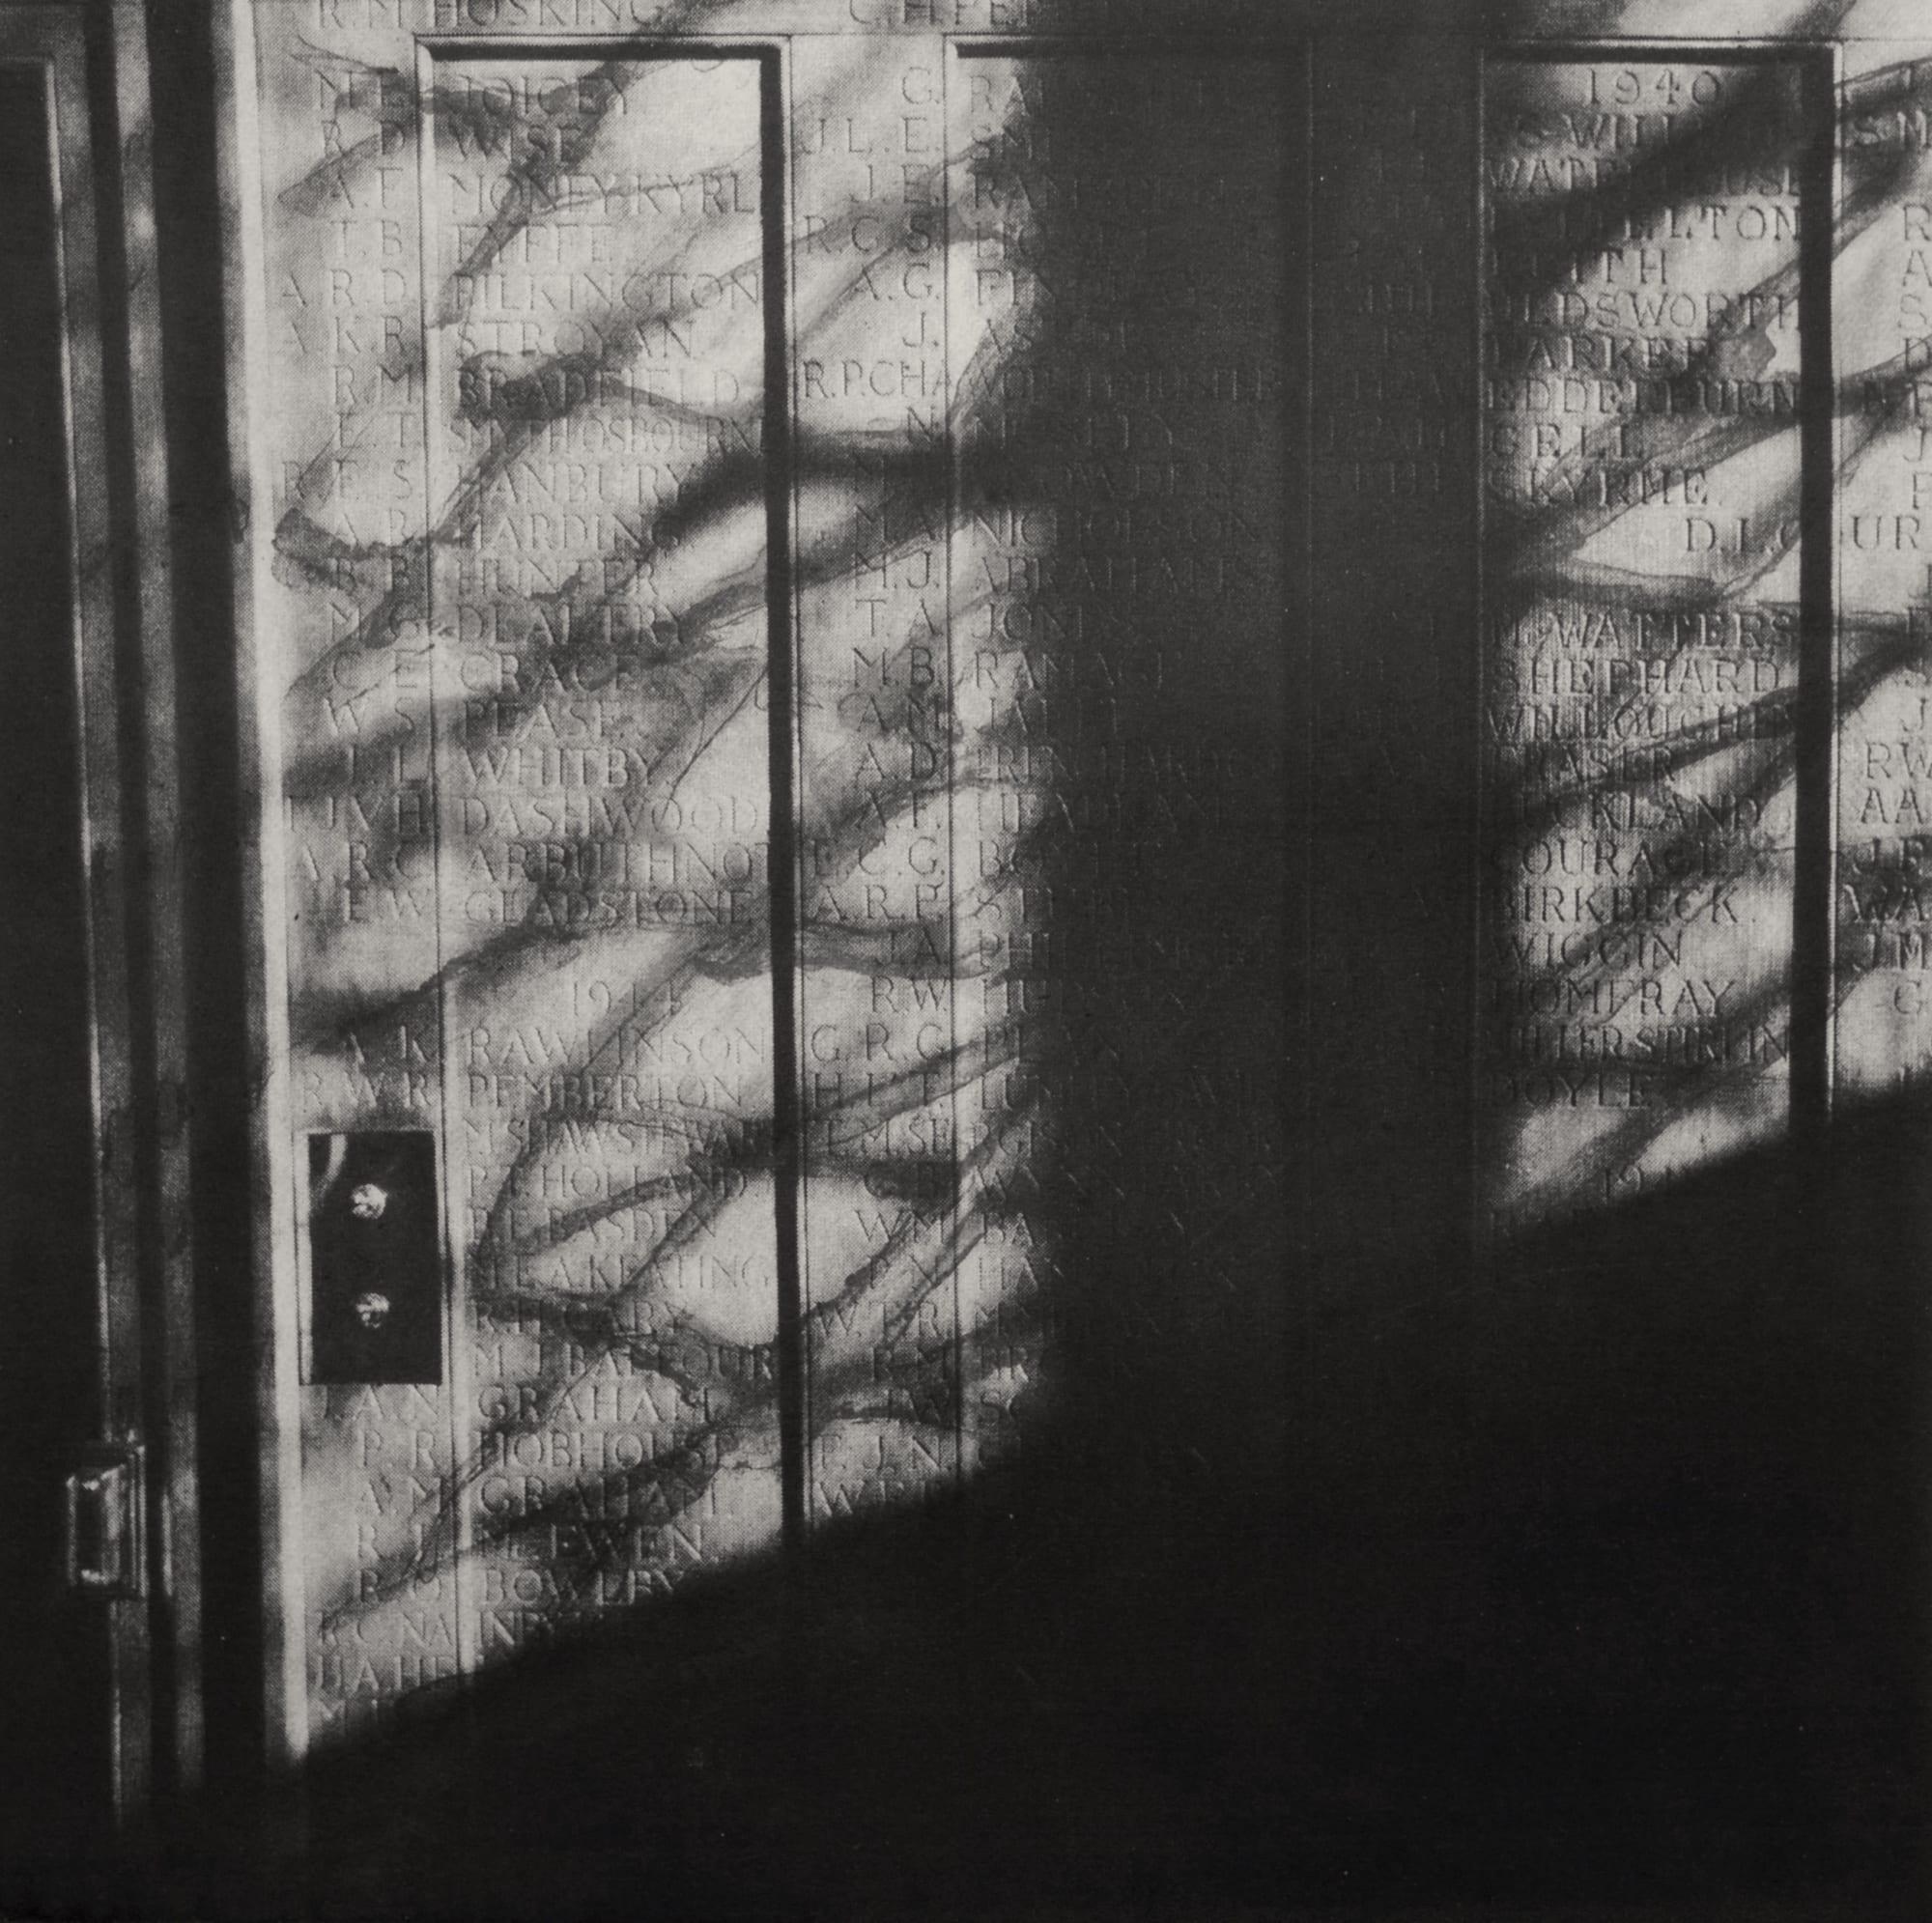 Lucy Bainbridge